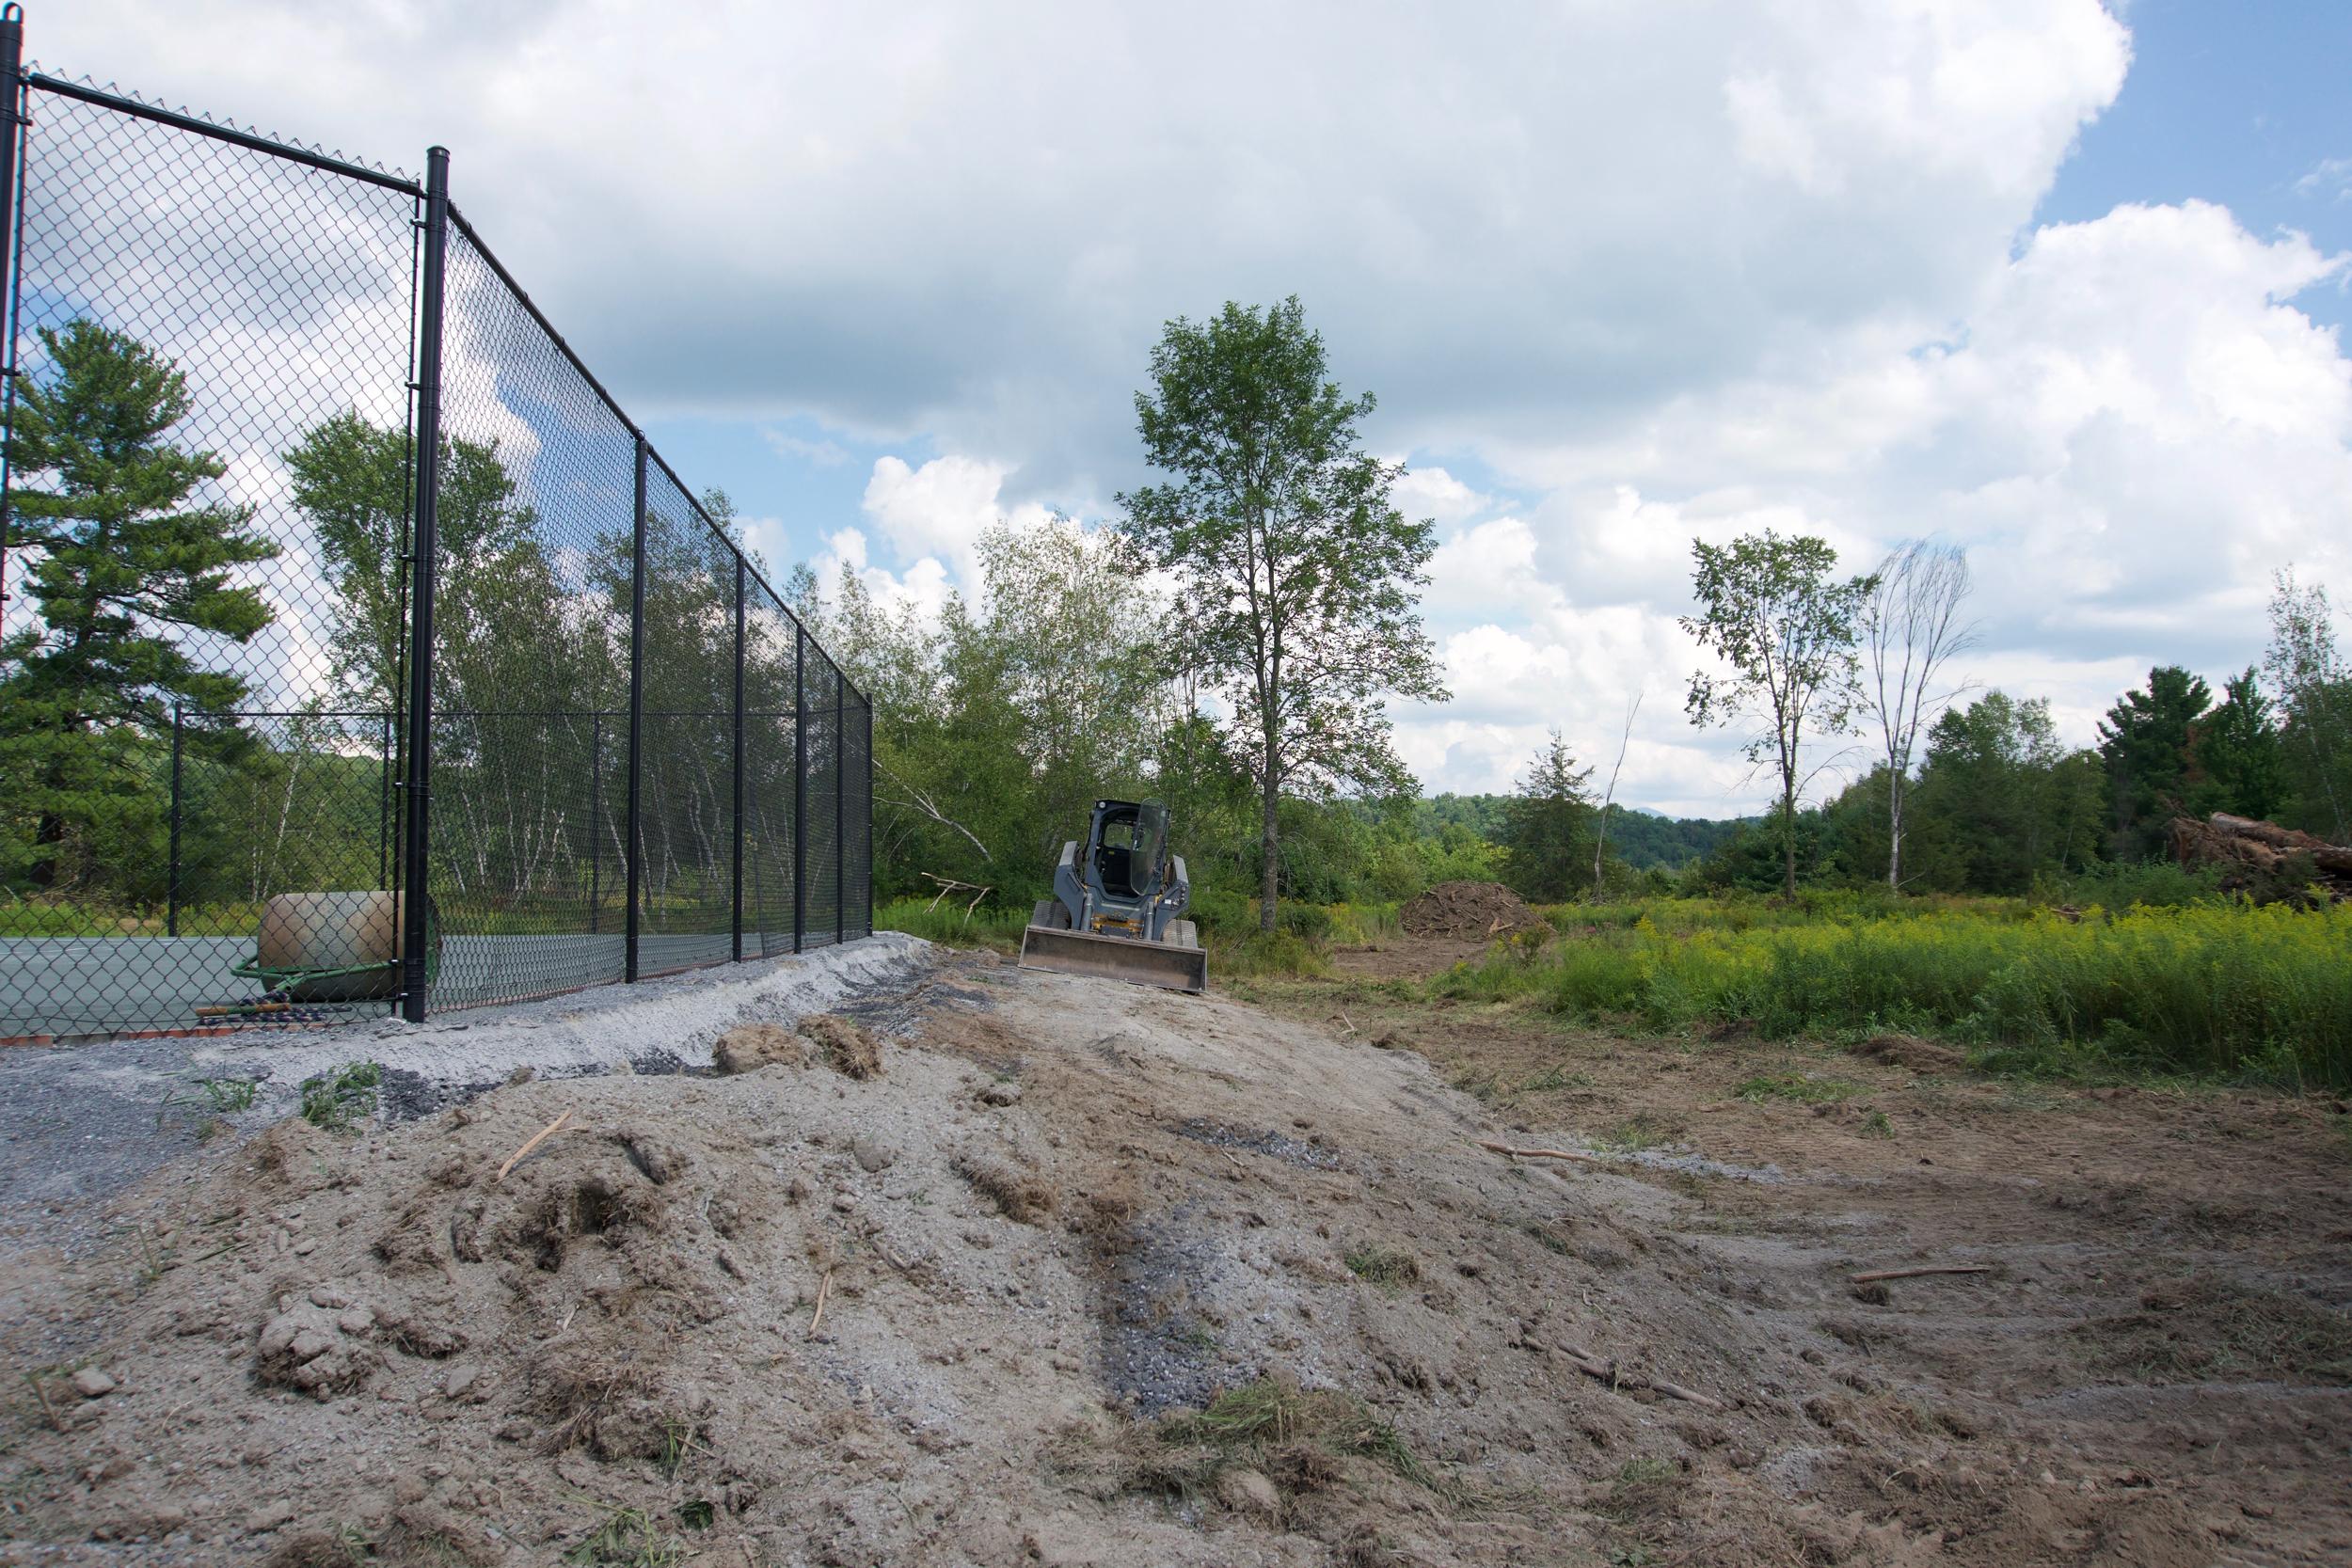 sitework on tennis court